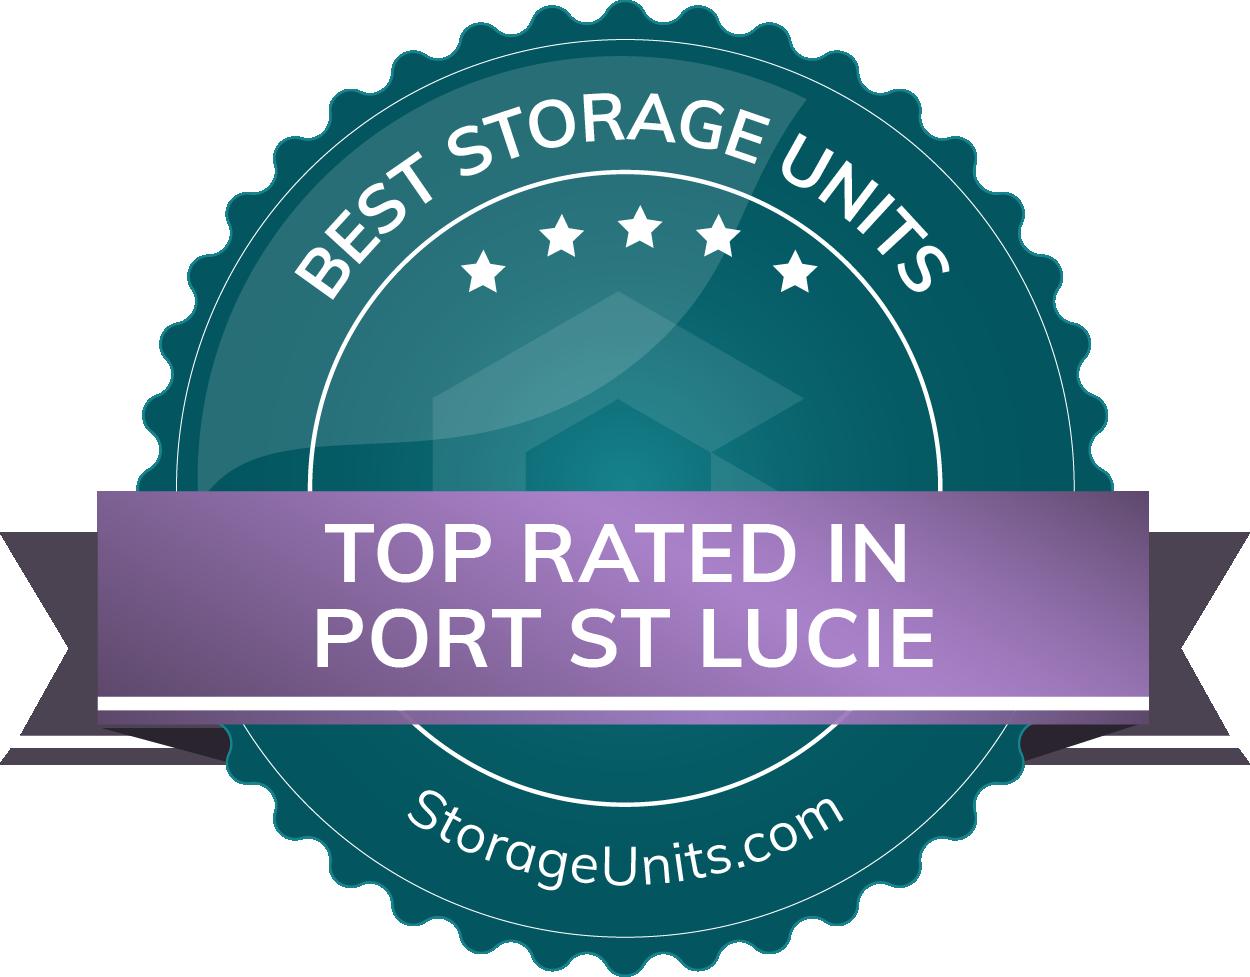 Best Self Storage Units in Port St Lucie, FL